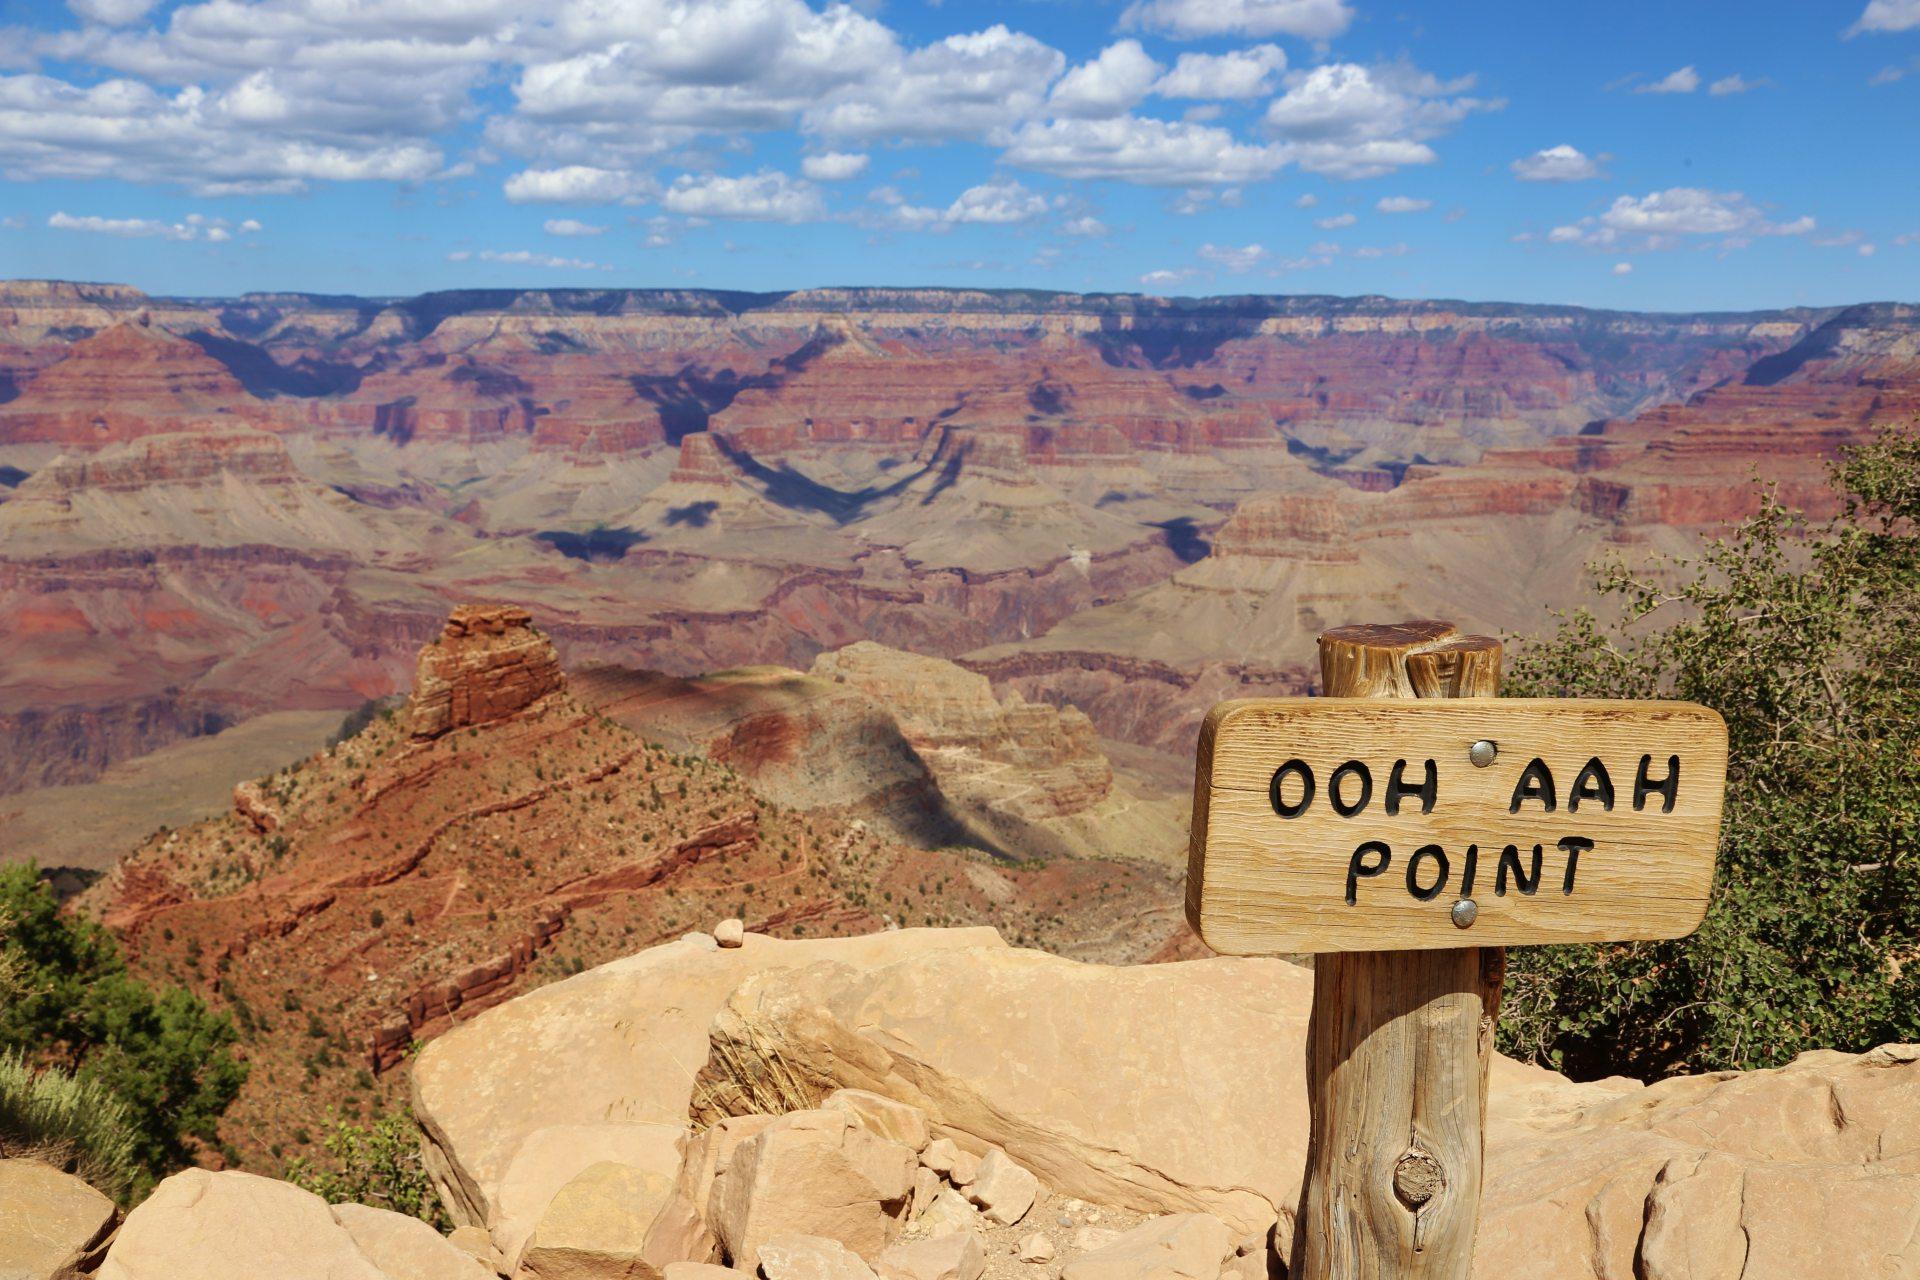 Der Name ist Programm - Arizona, Ausblick, Aussicht, Aussichtspunkt, Beschilderung, Felsen, Fernsicht, Grand Canyon National Park, Himmel, Klippen, Landschaft, malerisch, Natur, Ooh Aah Point, Panorama, Pfad, Portrait, Porträt, Schatten, Schild, Schlucht, South Kaibab Trail, Steine, Tafel, traumhaft, Wanderweg, Wattewolken, Weg, Wolken - (Grand Canyon, Arizona, Vereinigte Staaten)